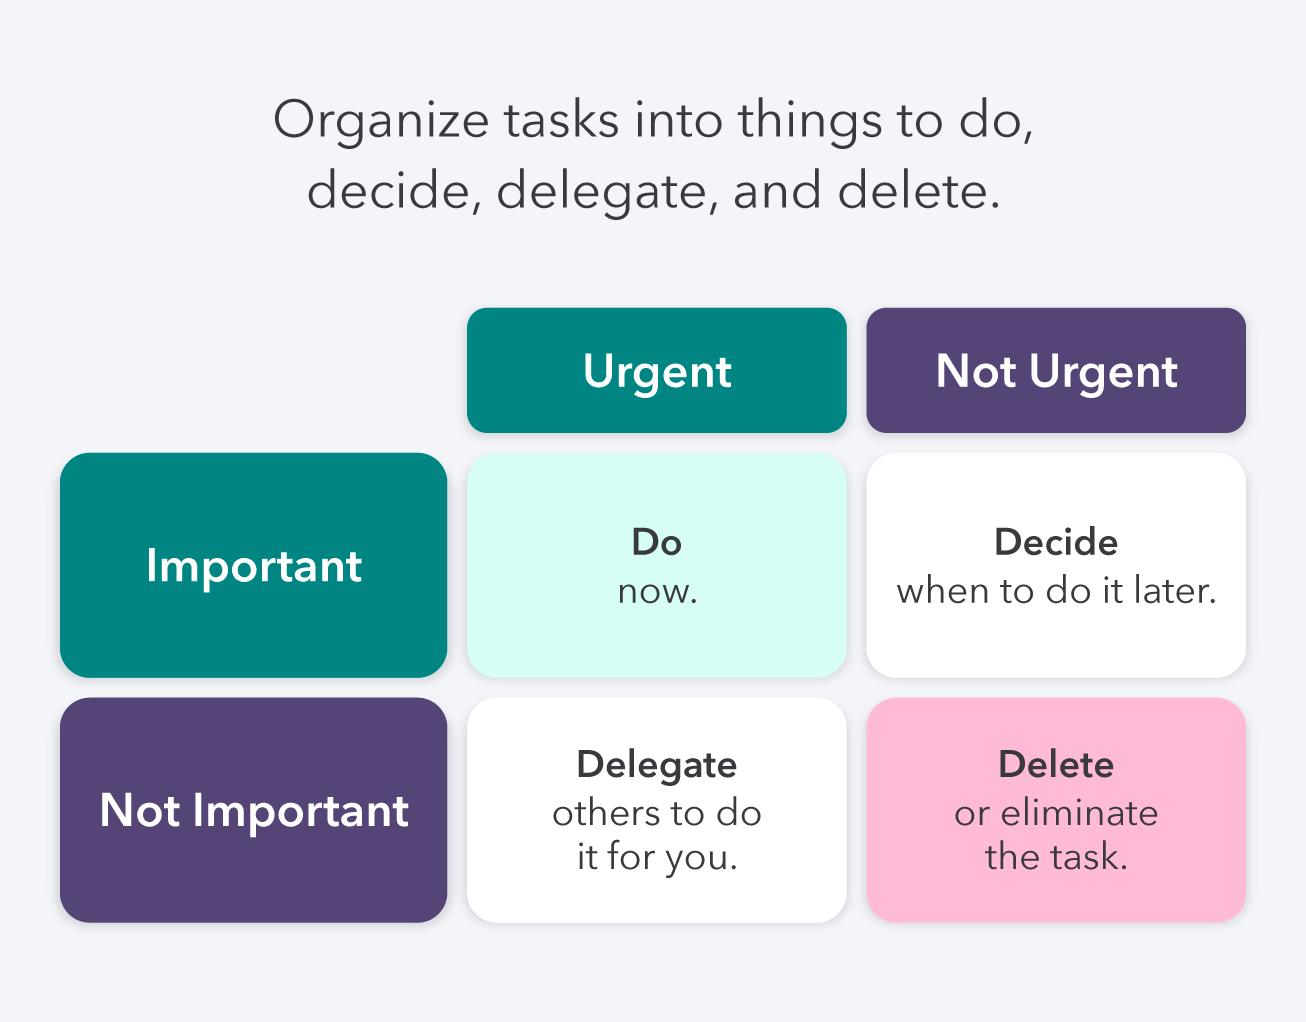 eisenhower-matrix-task-organization